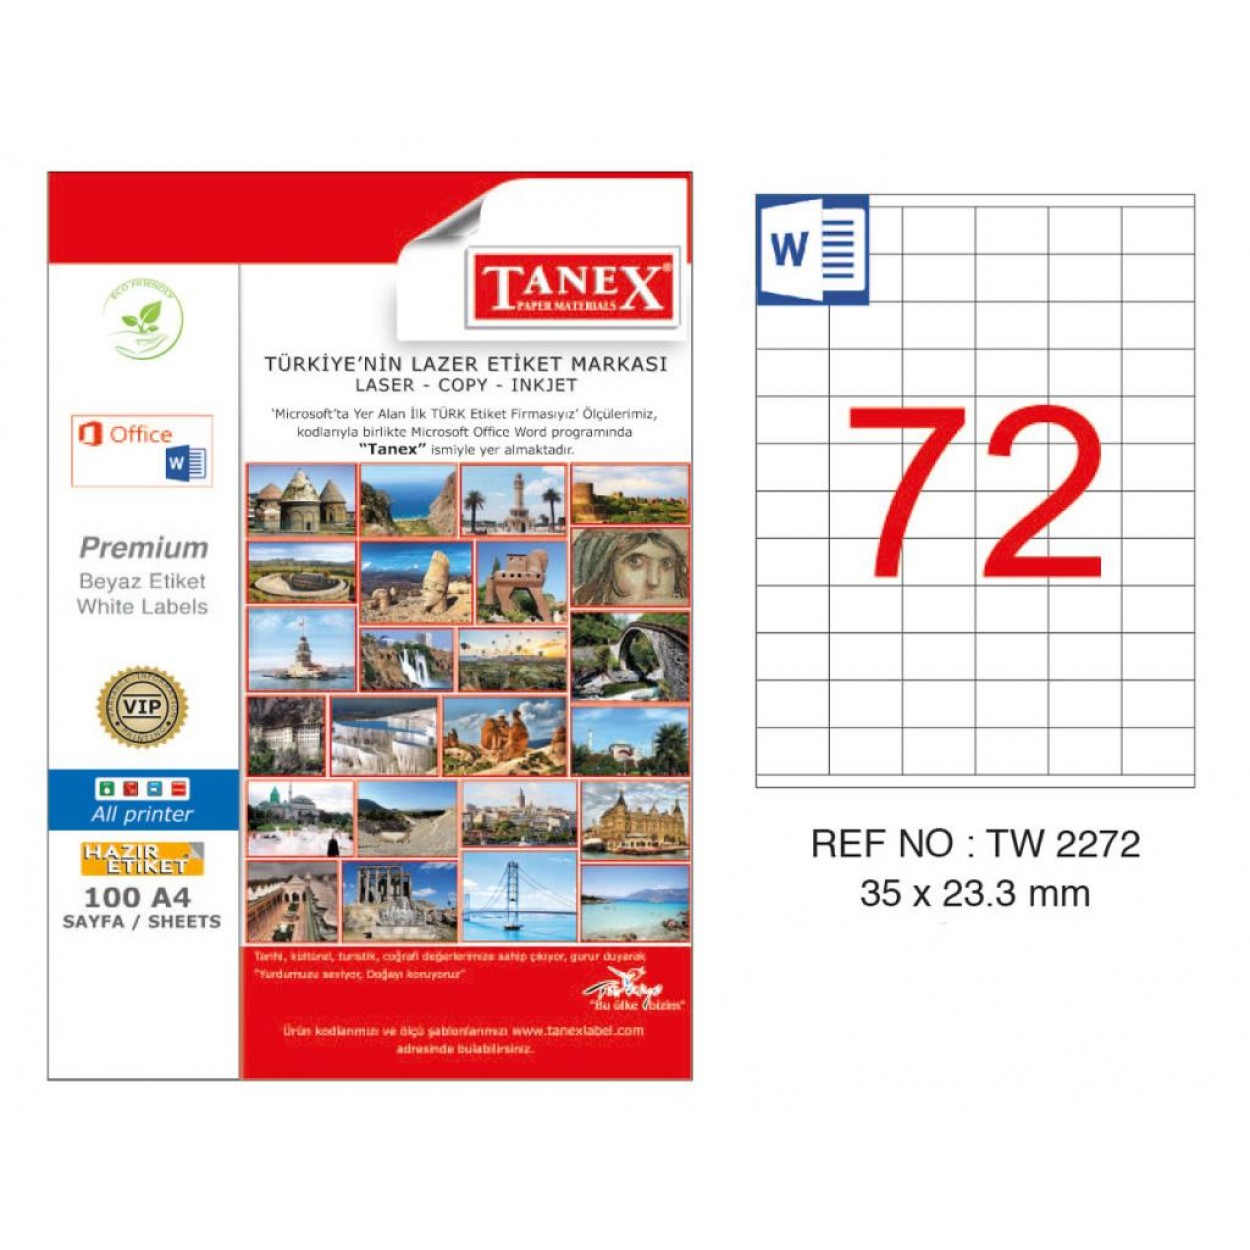 Tanex TW-2272 35x23.3mm Kuşe Lazer Etiket 100 Lü Paket